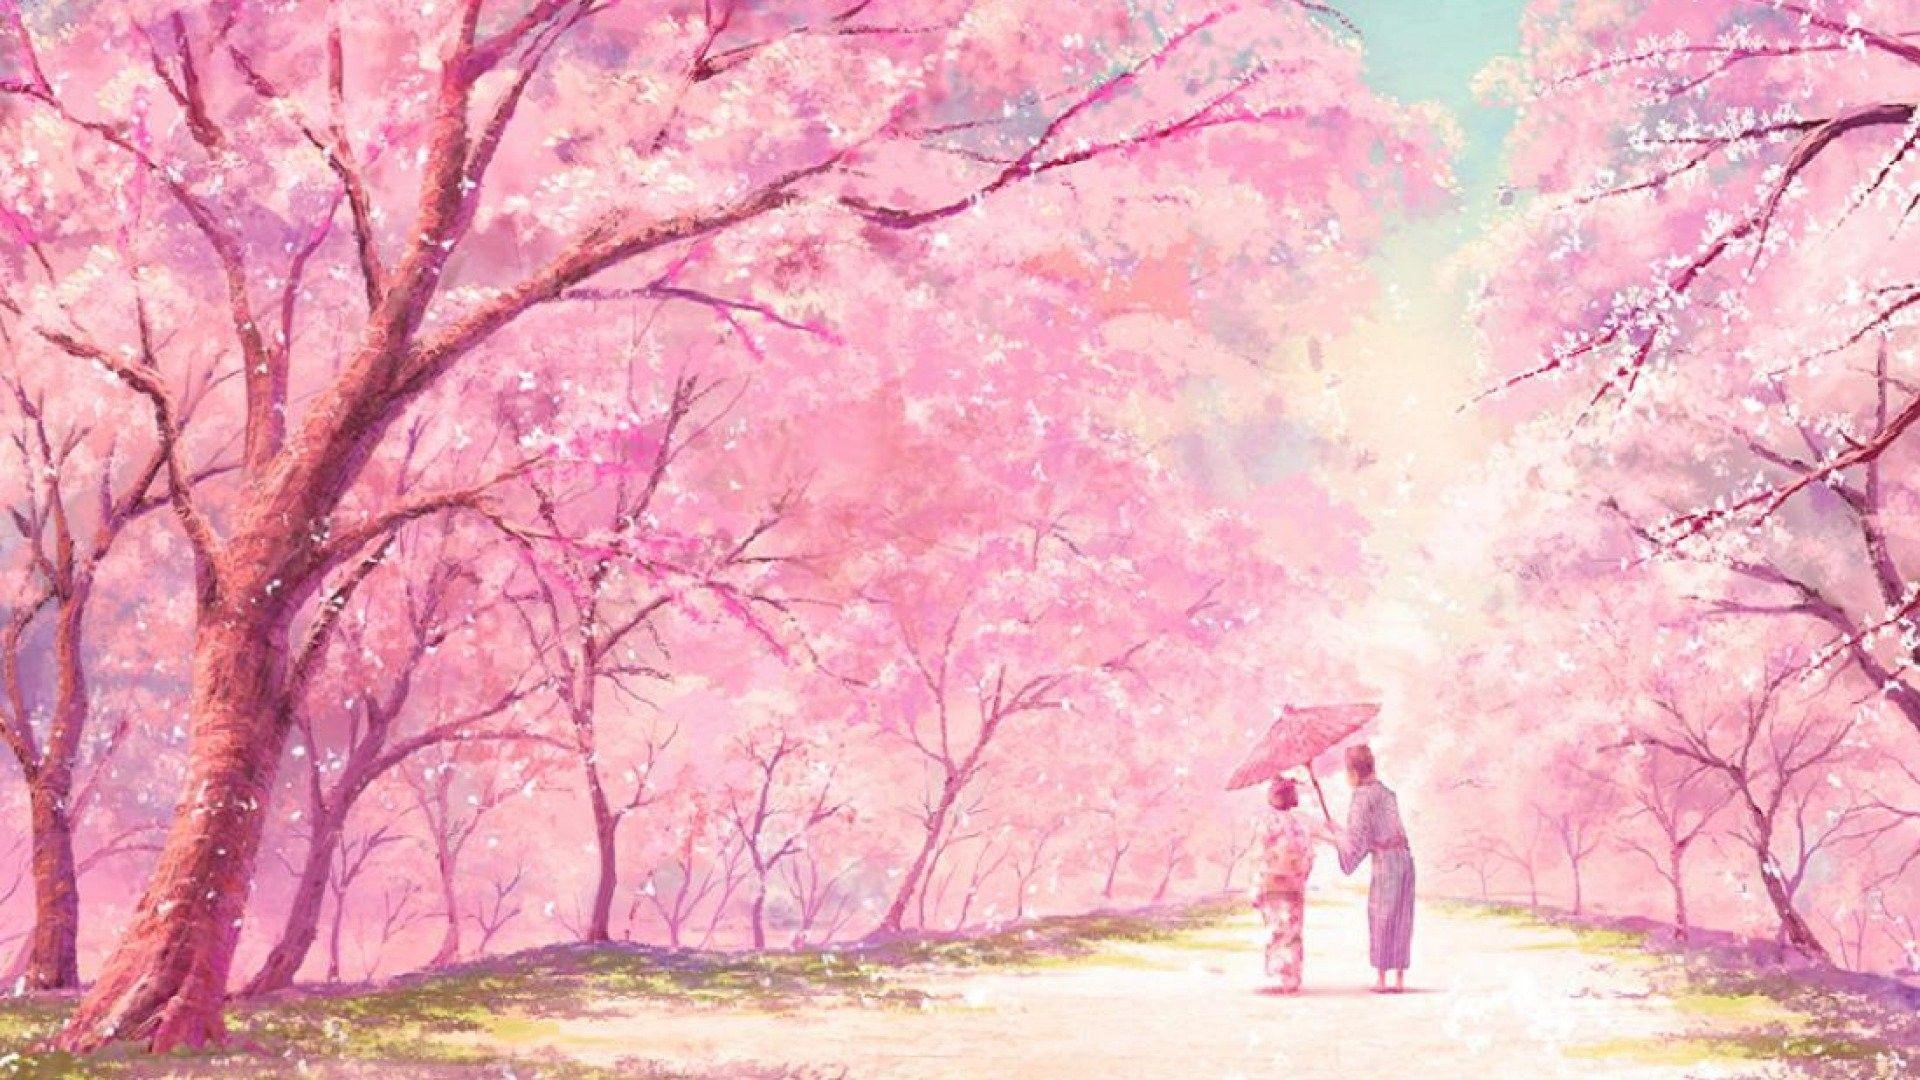 Aesthetic Pink Desktop Wallpapers - Top Free Aesthetic ...